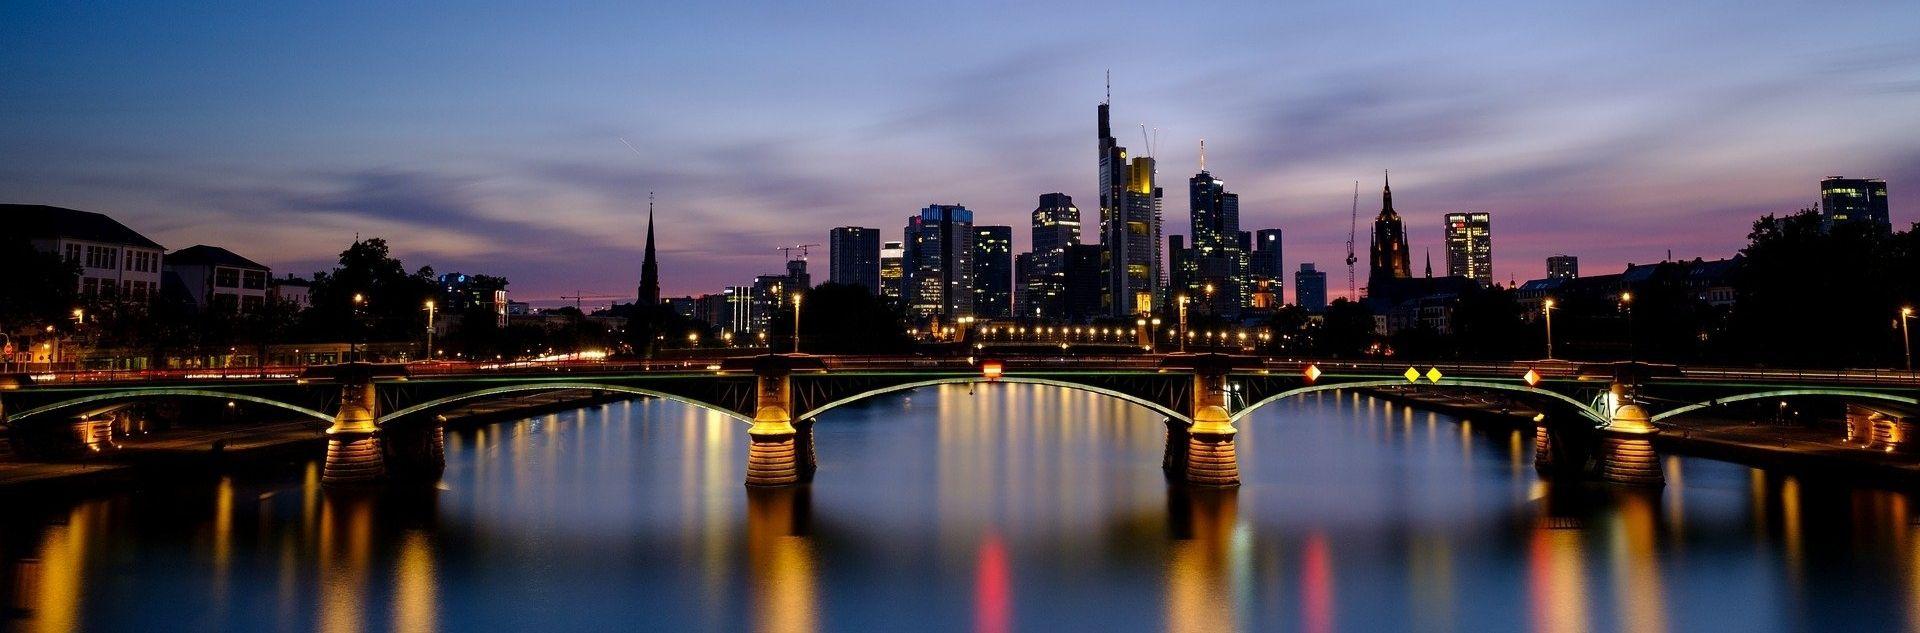 Travel Agency Lufthansa City Center Headquarters in Frankfurt